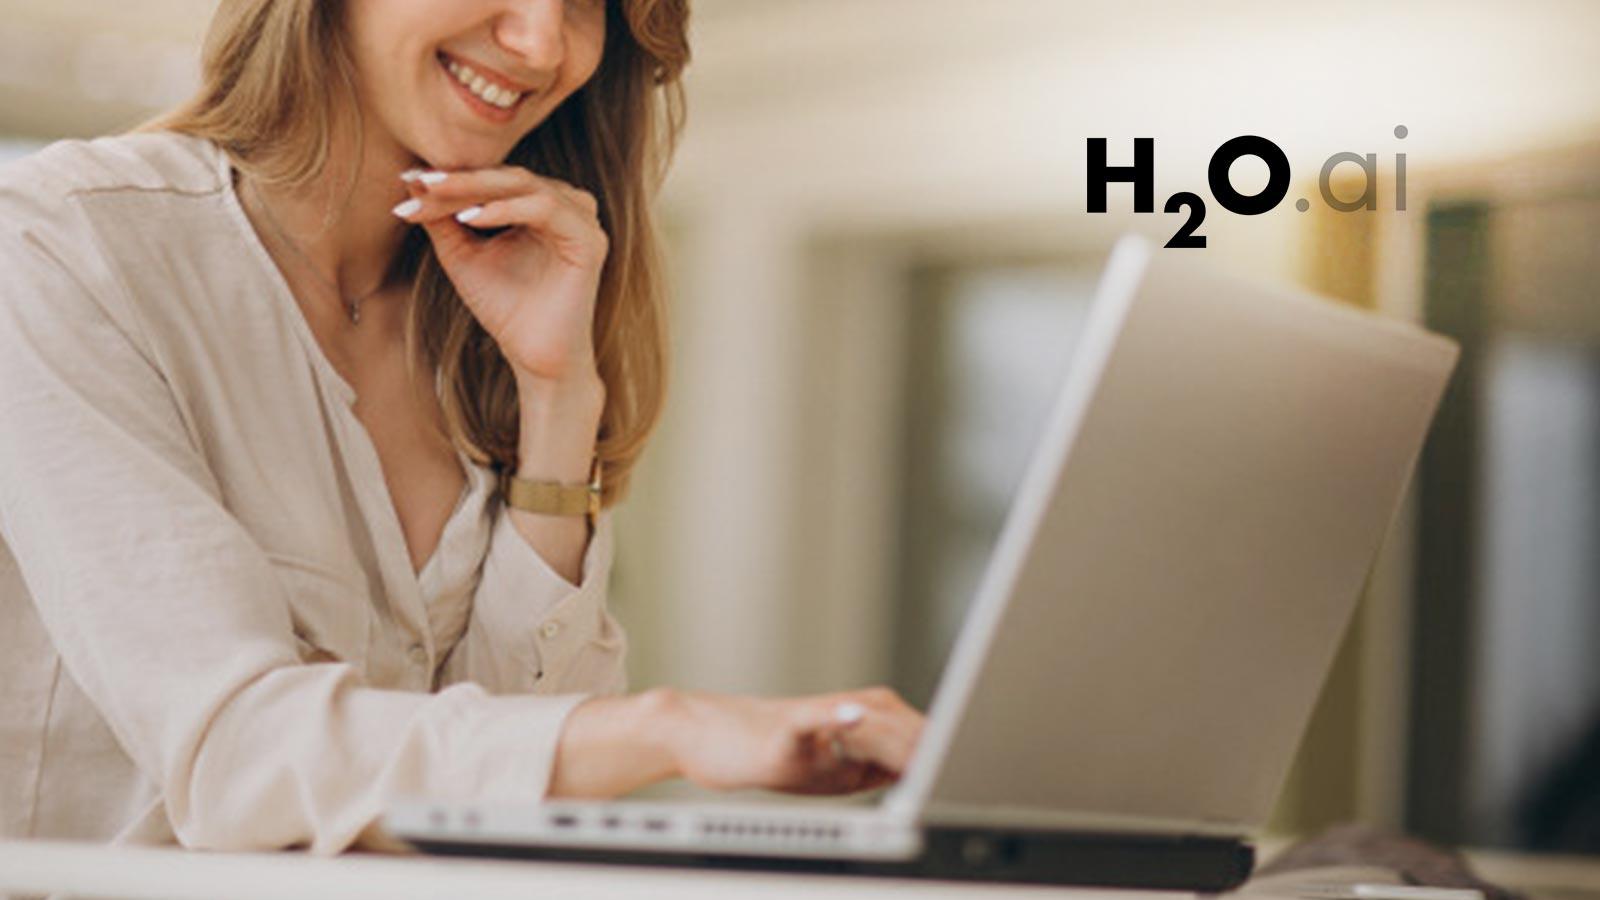 H2O.ai Data Scientist #1 In Kaggle Rankings